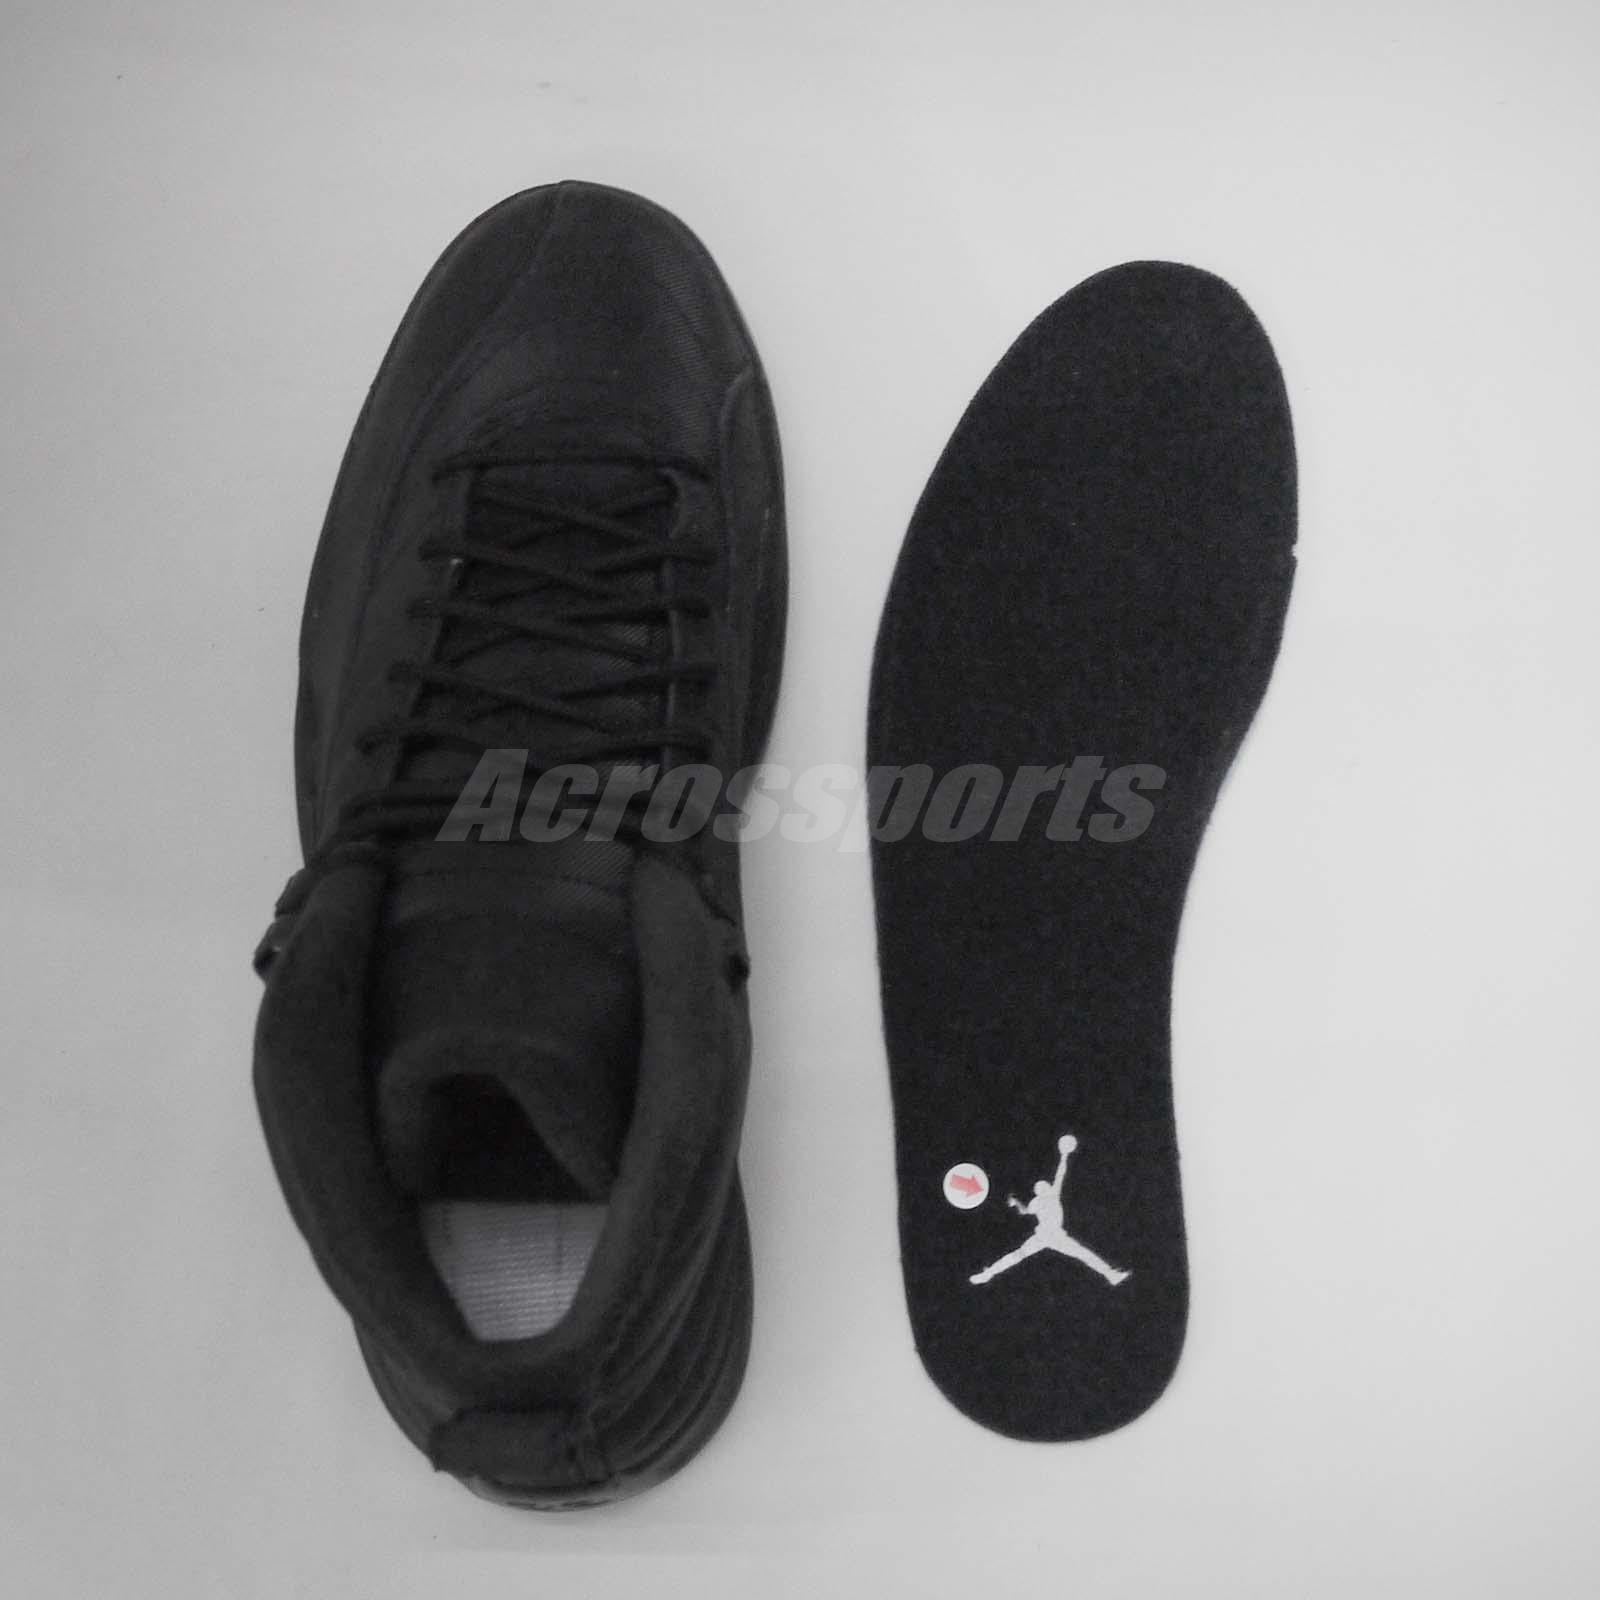 sports shoes bb0c4 a752b Details about Nike Air Jordan 12 Retro WNTR Left Foot With Defect Men Shoes  US10 BQ6851-001